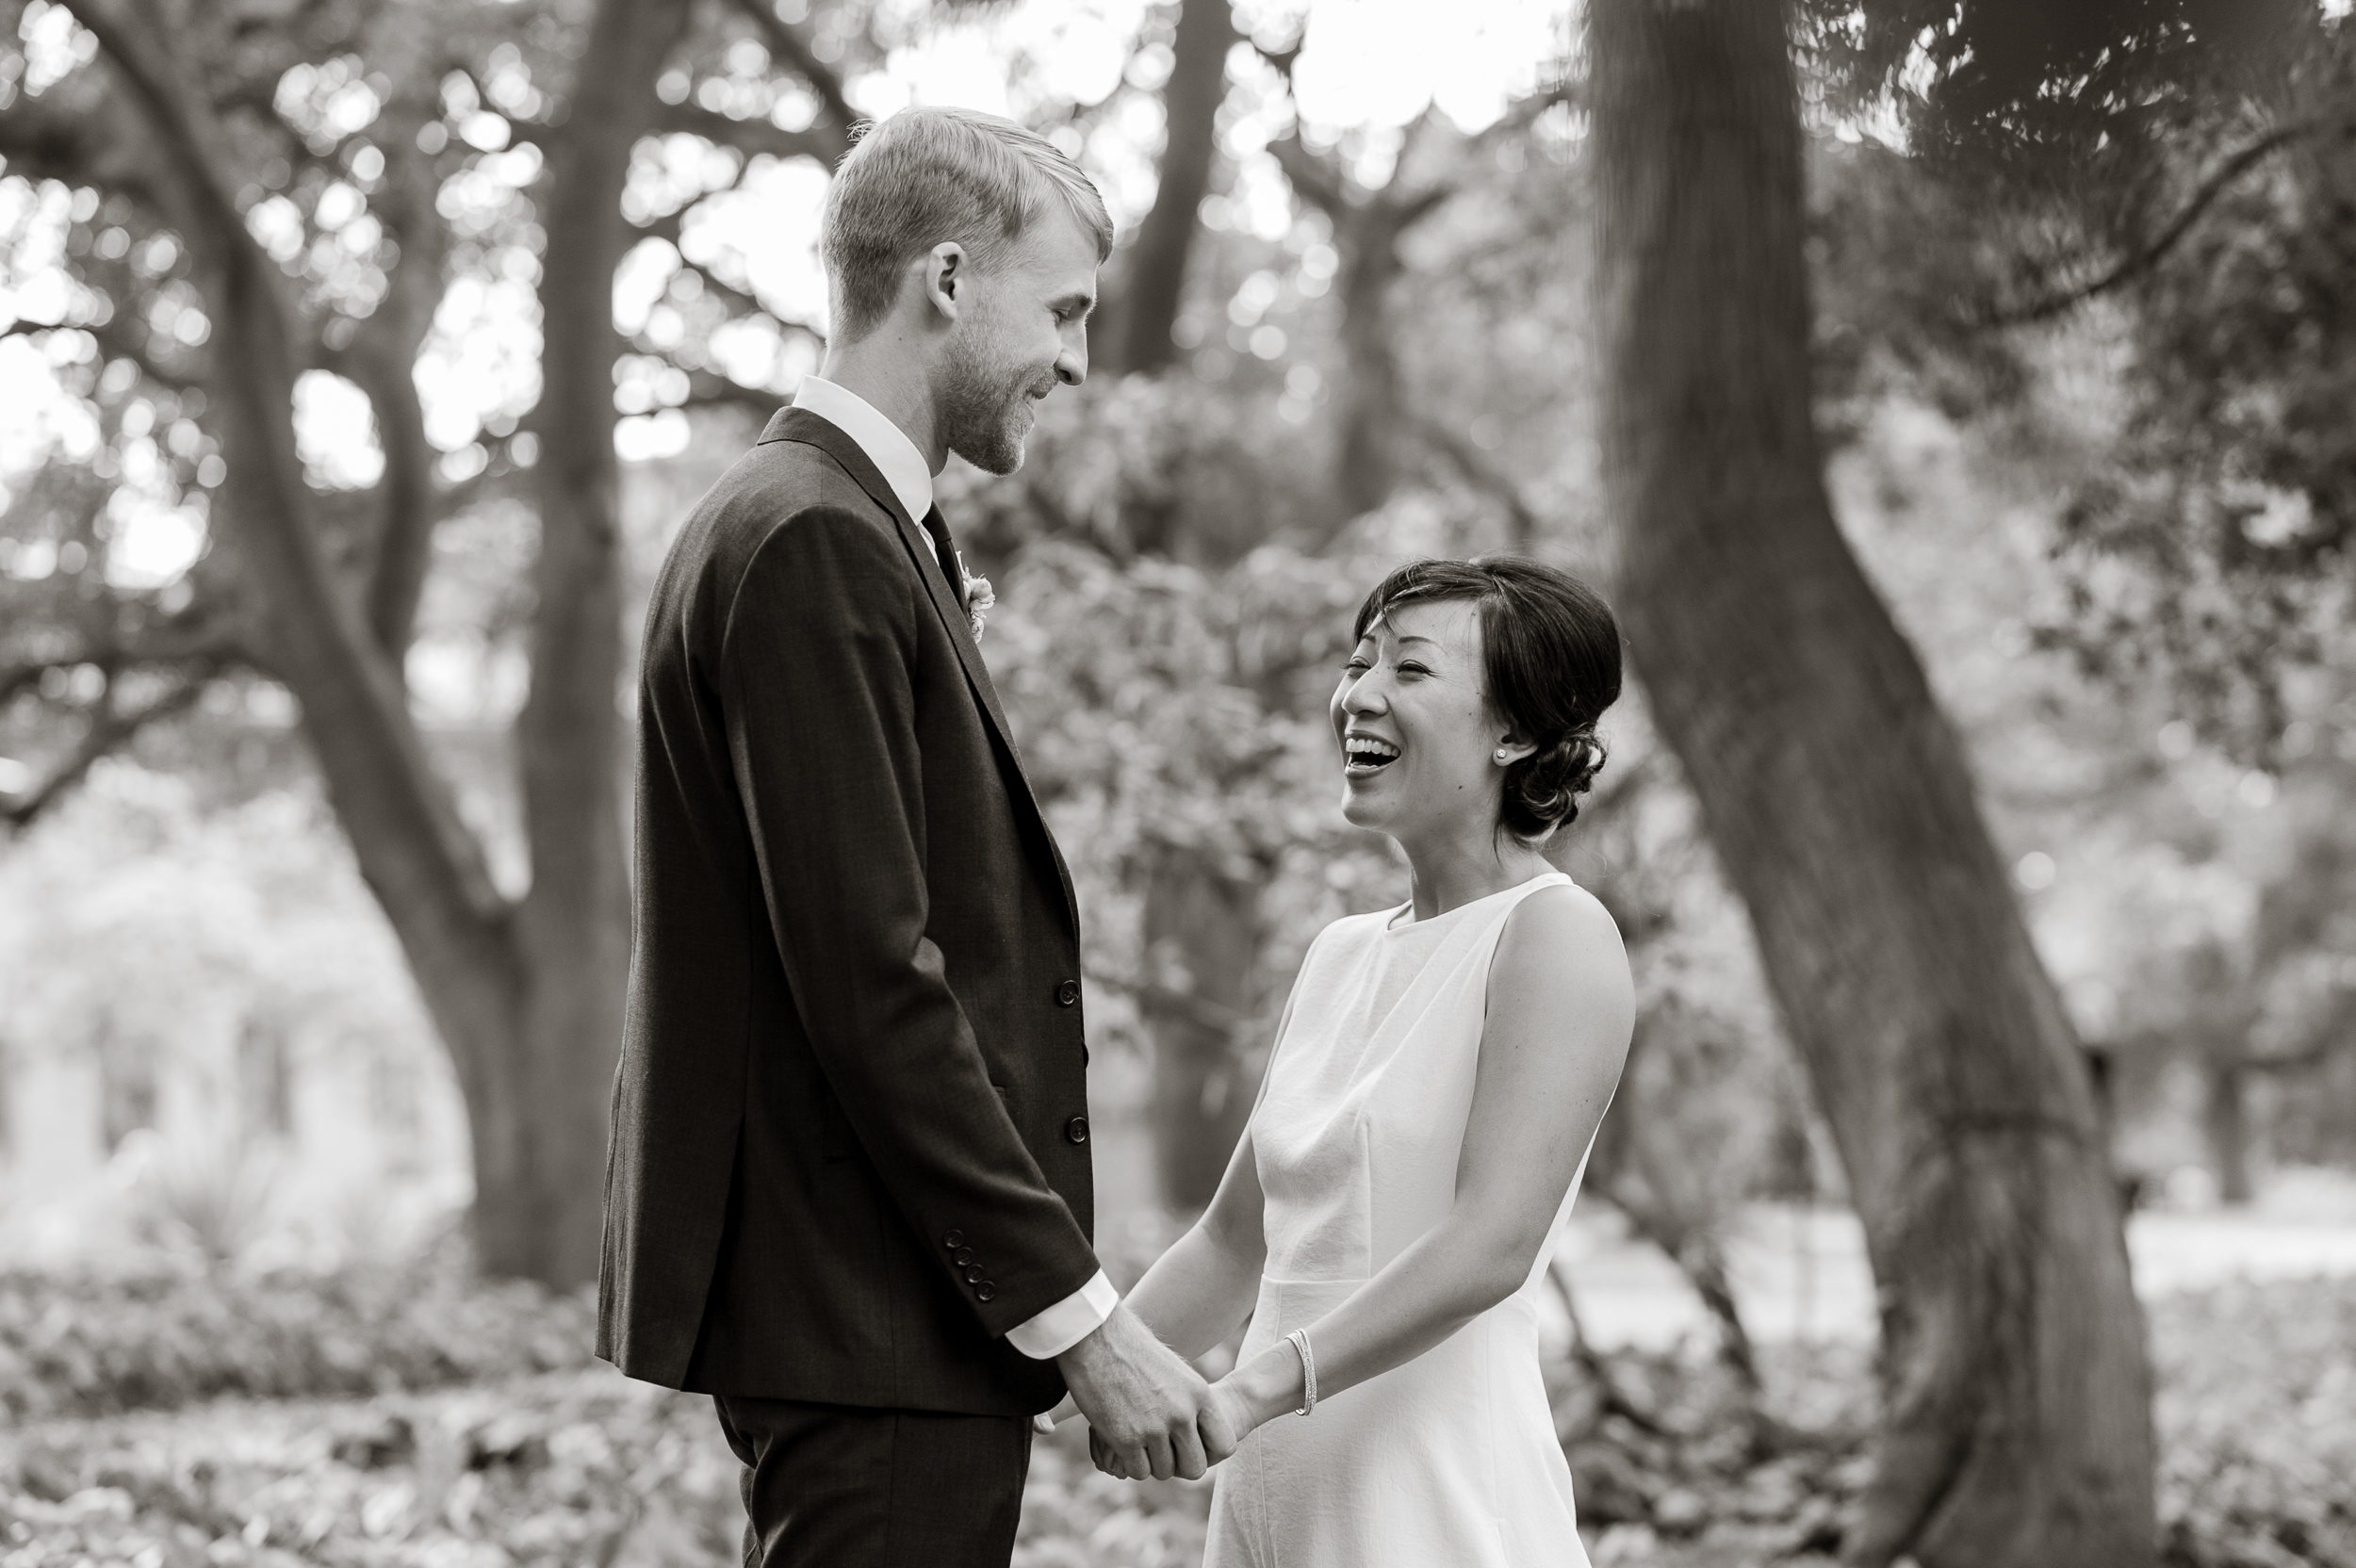 faculty-club-berkeley-wedding-photographer-vc021.jpg